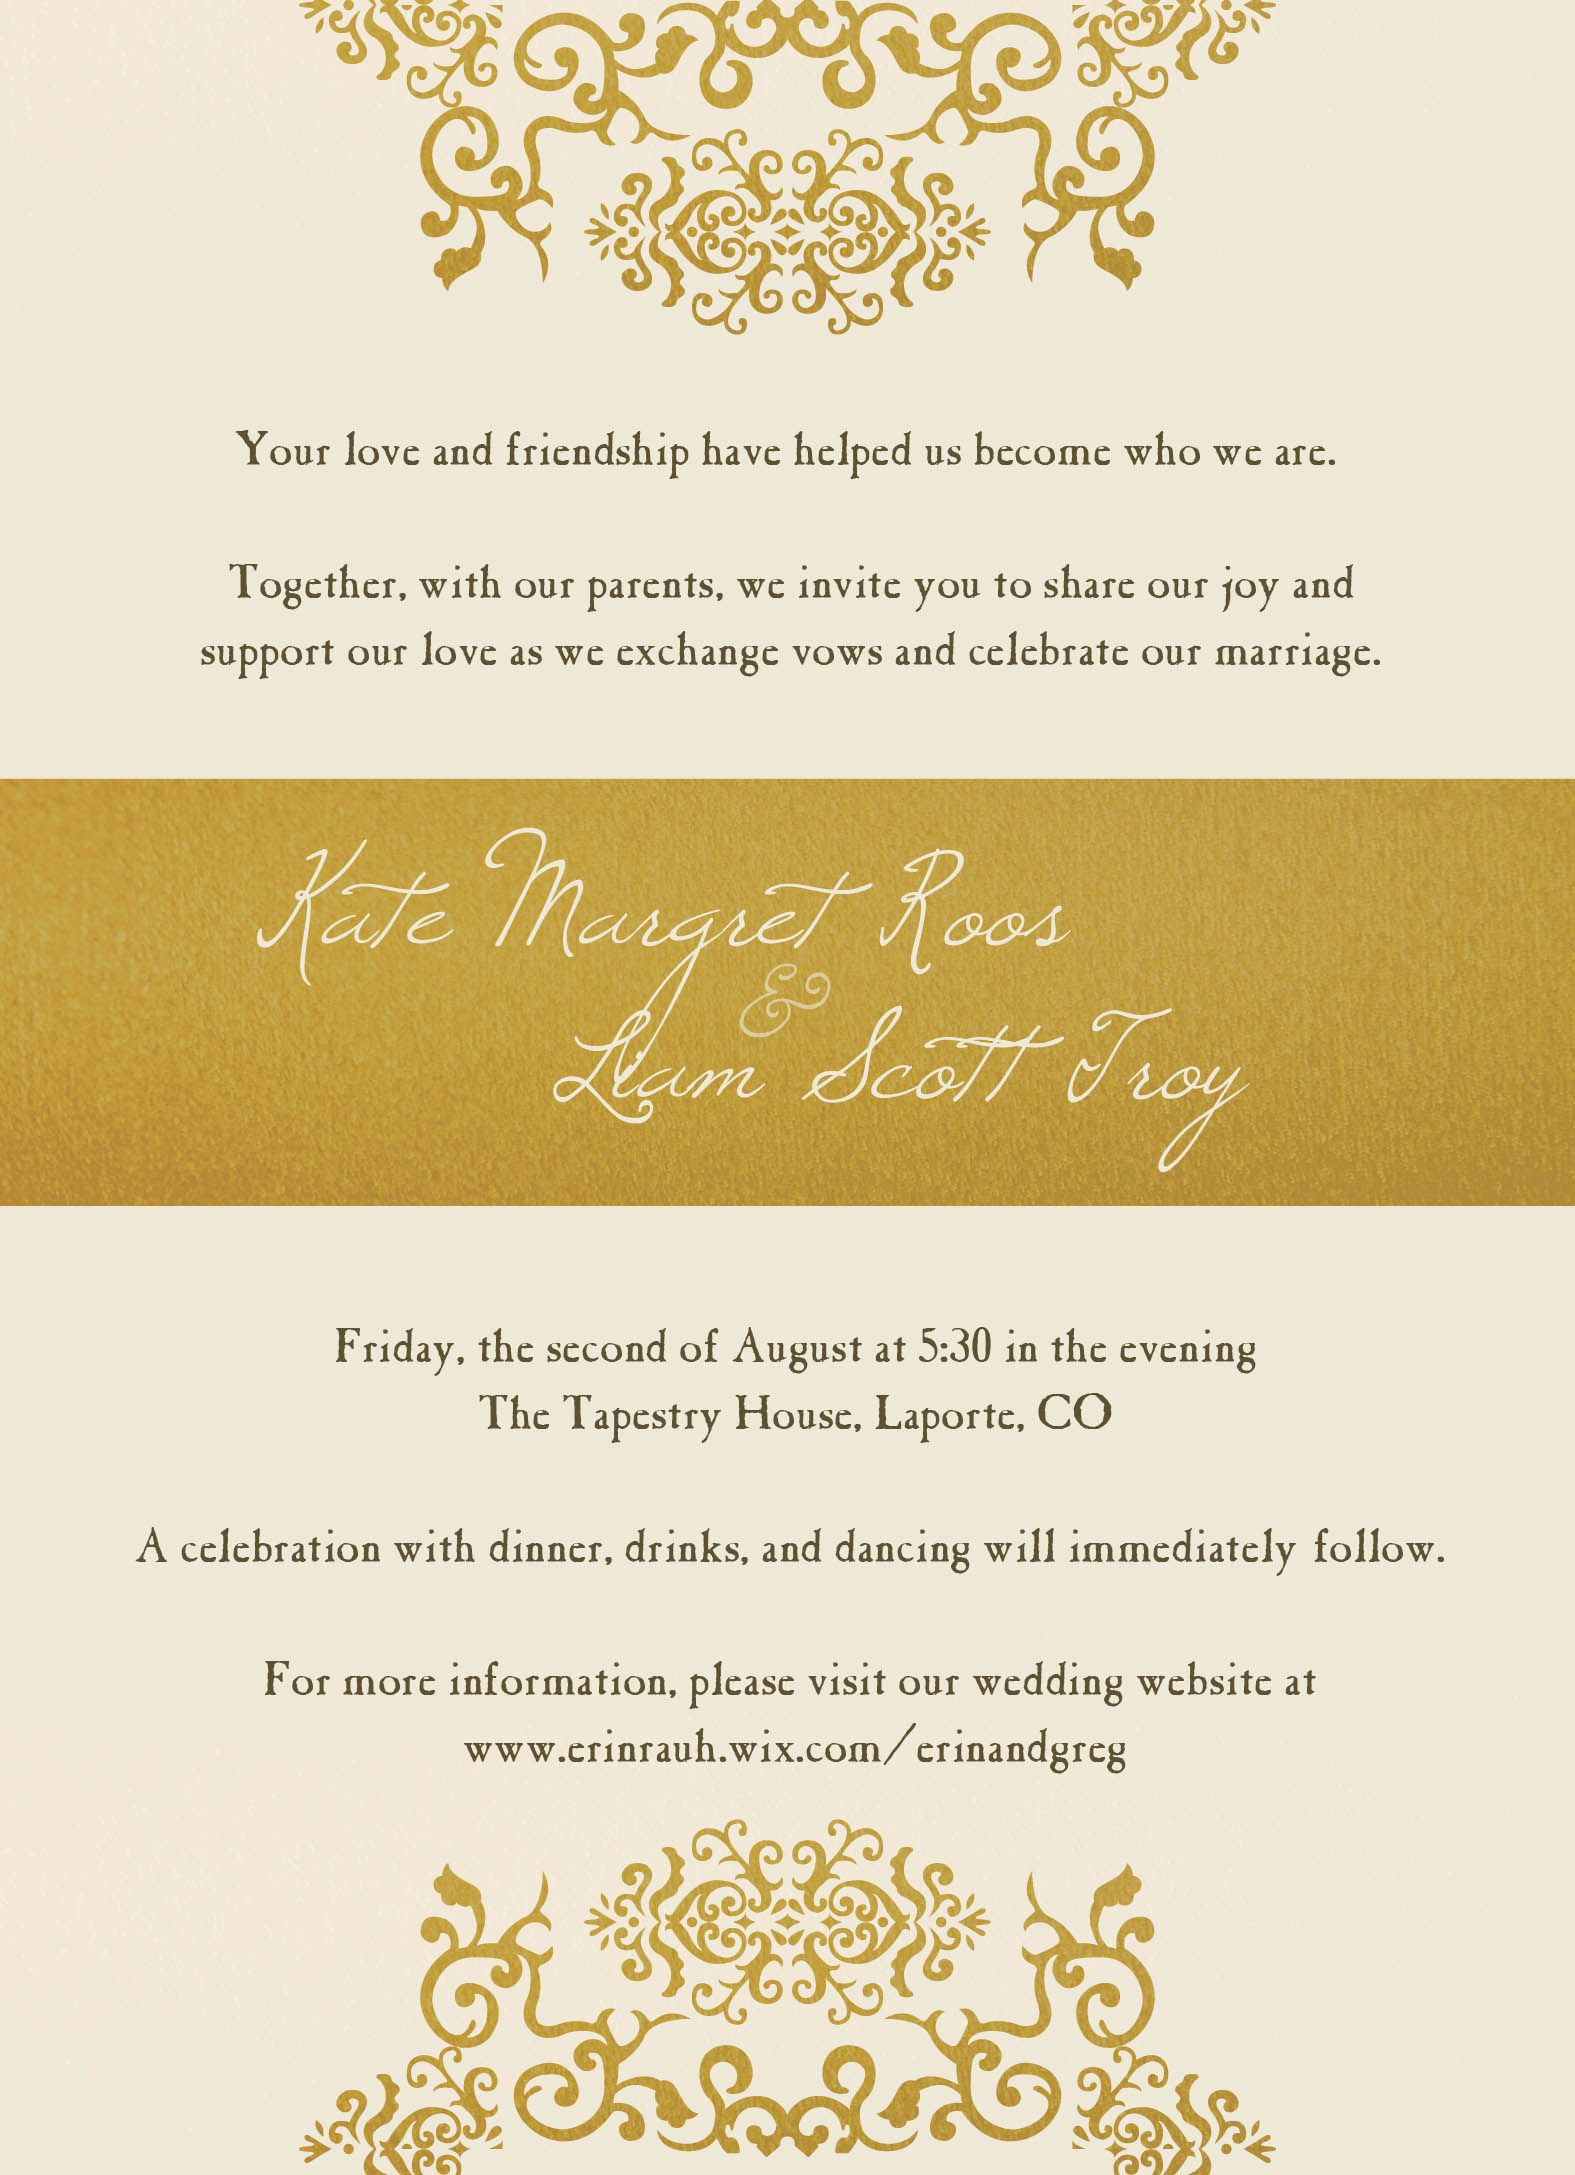 Invitation Custom Designed The Print Cafe invite